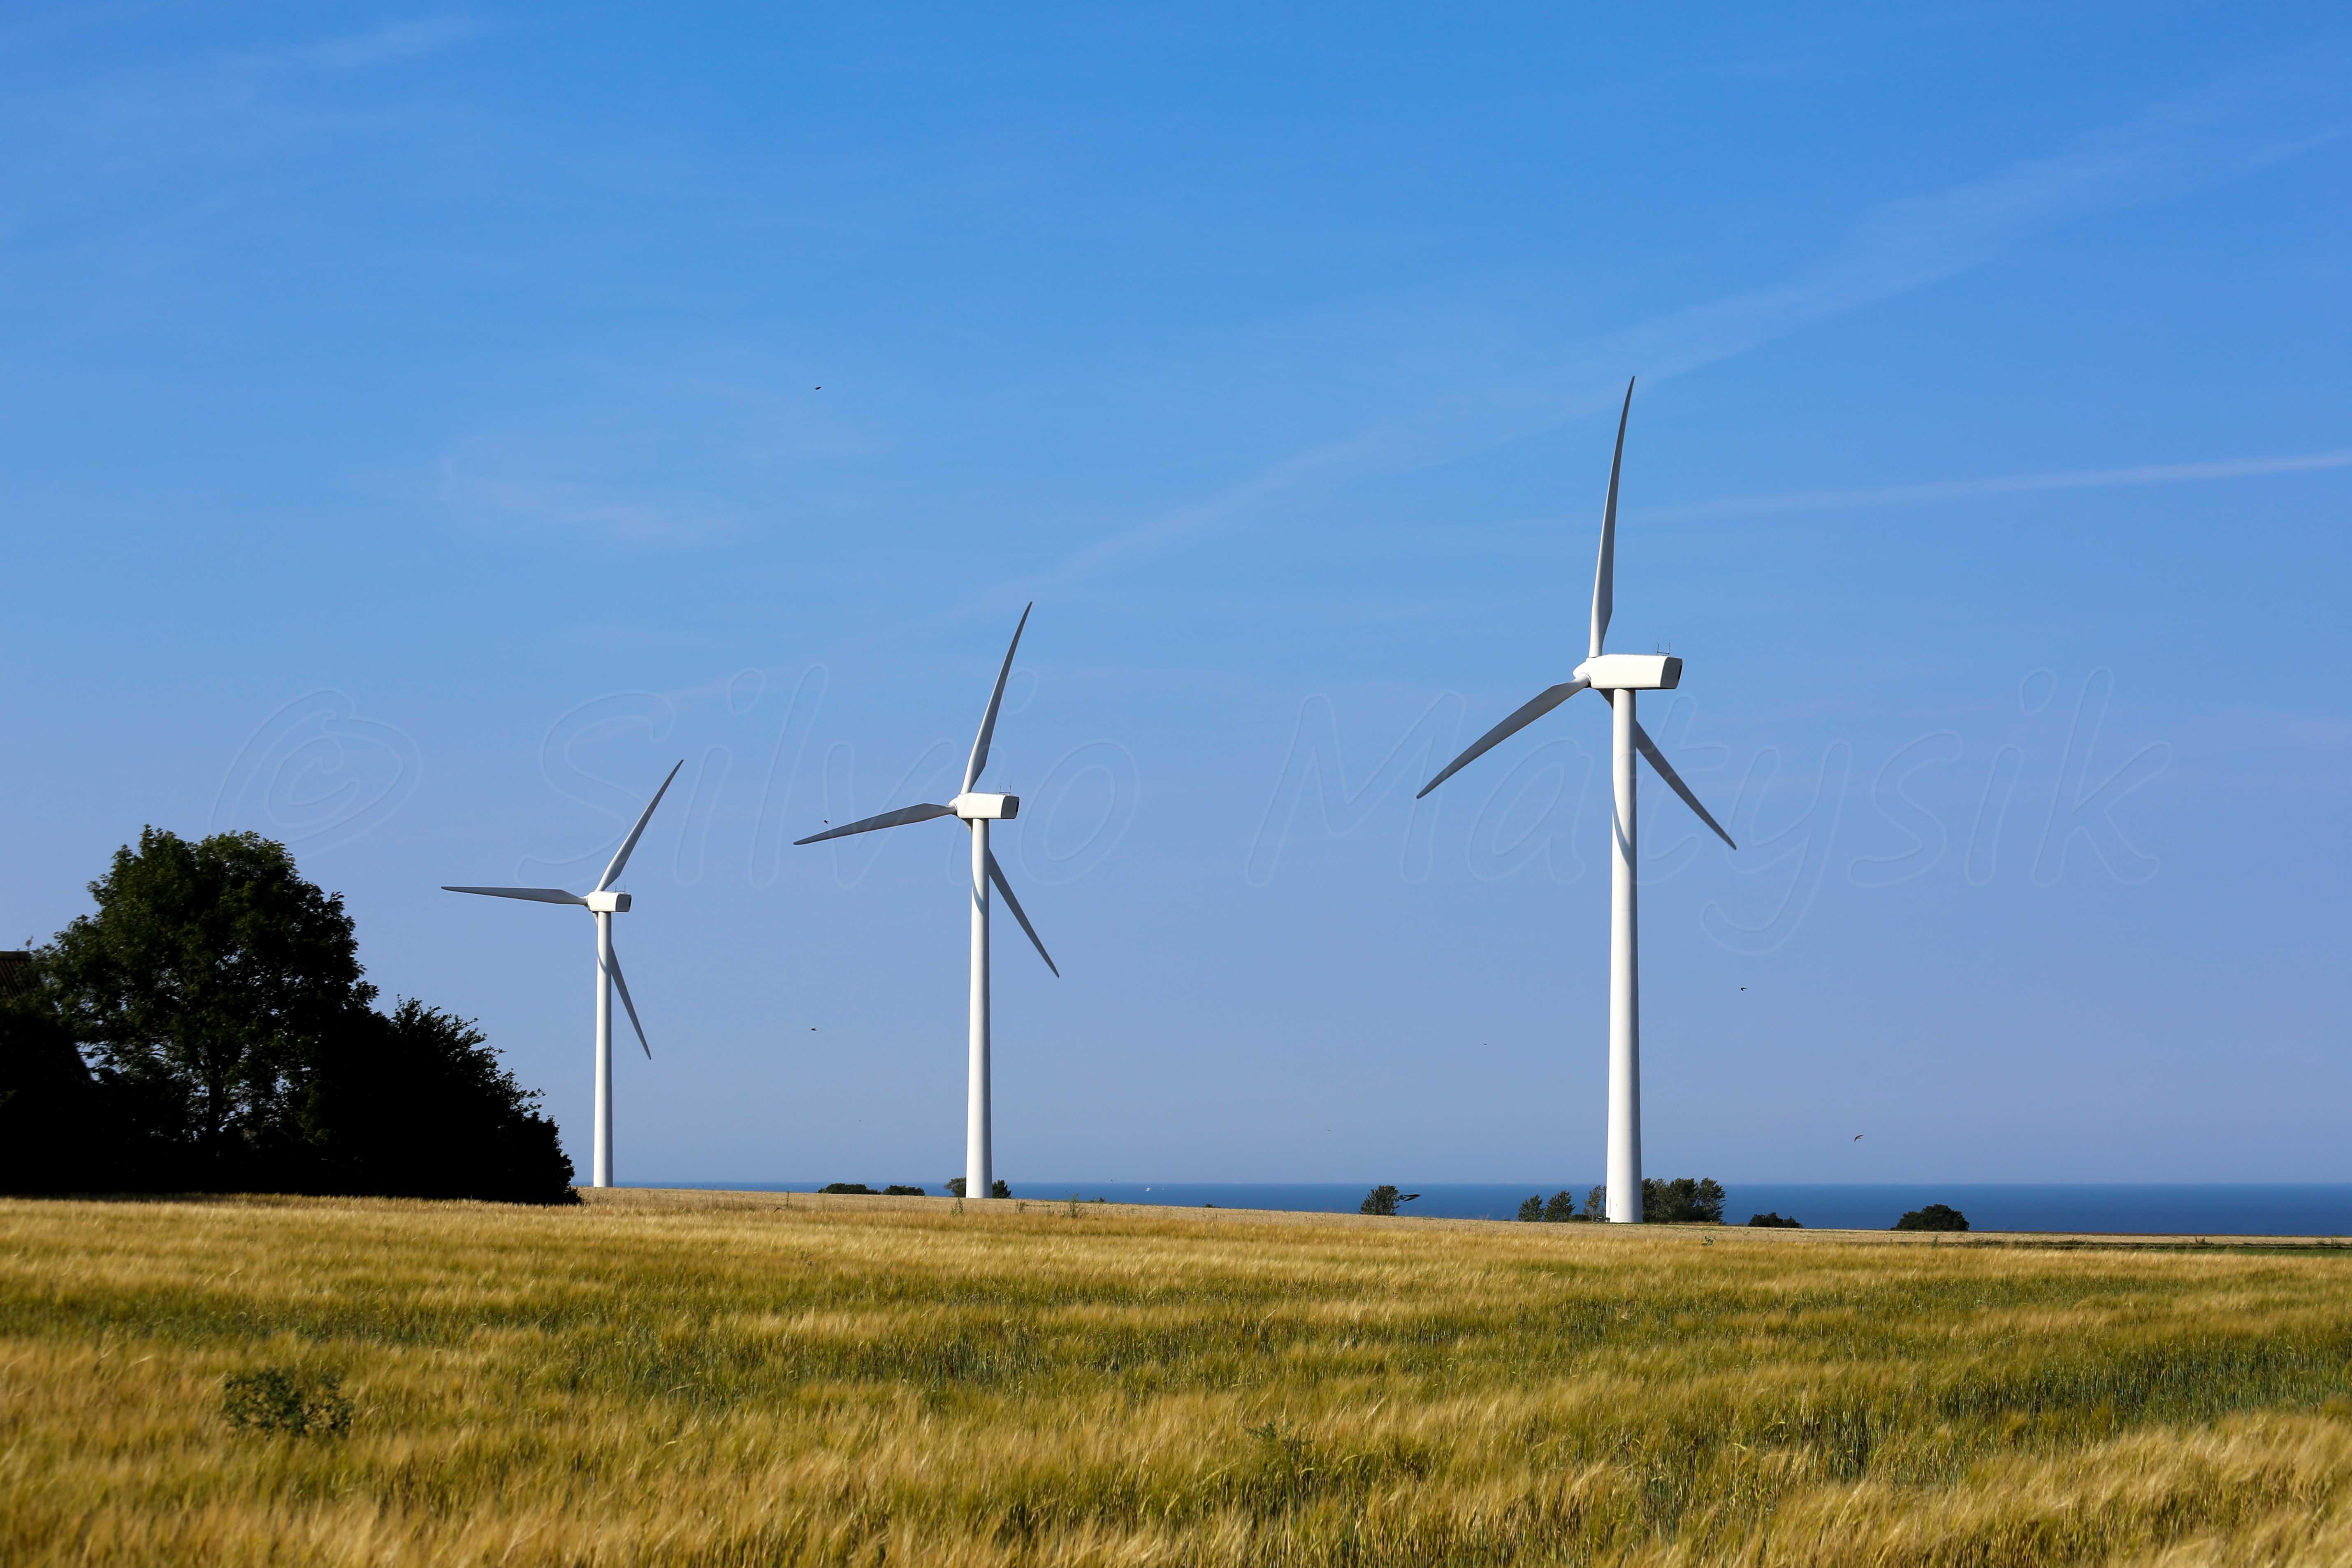 Vestas V66 175 Mw Wind Turbine 24 Volt Wiring Diagram Datasheet